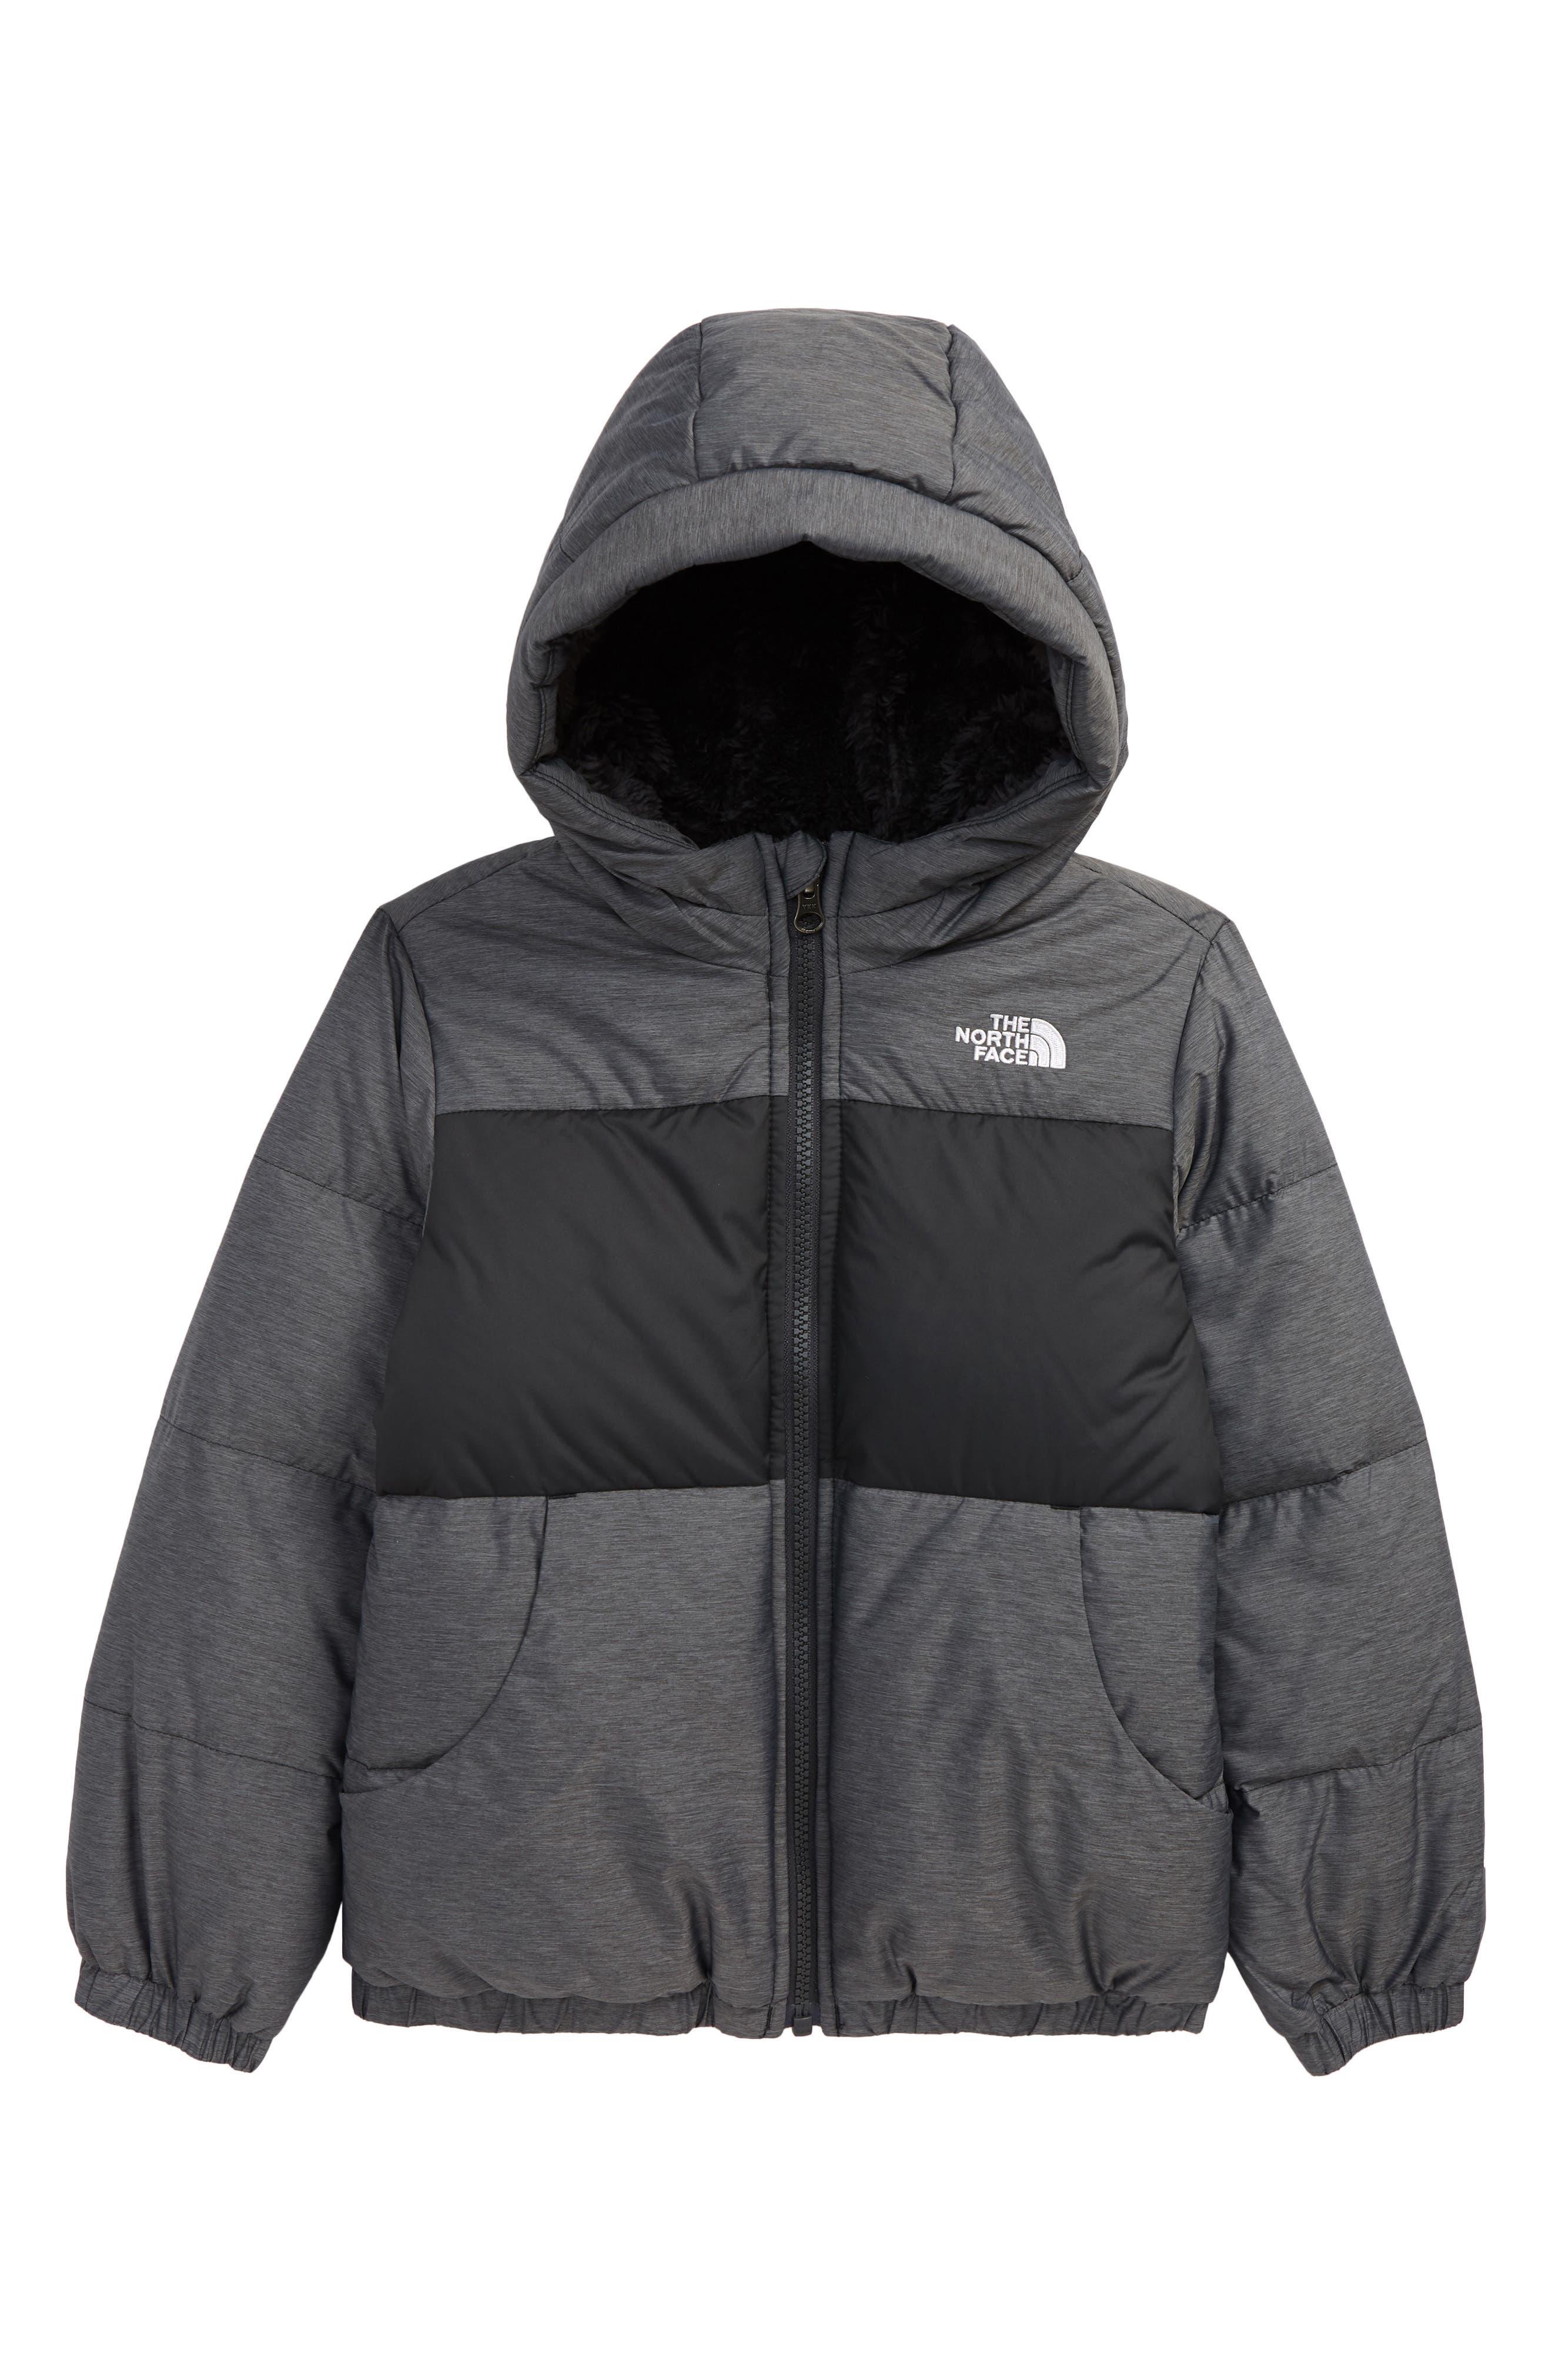 GETUBACK Winter Down Jacket for Boys Coat Chilrens Outwear Kids Waterproof Windproof 3-12T